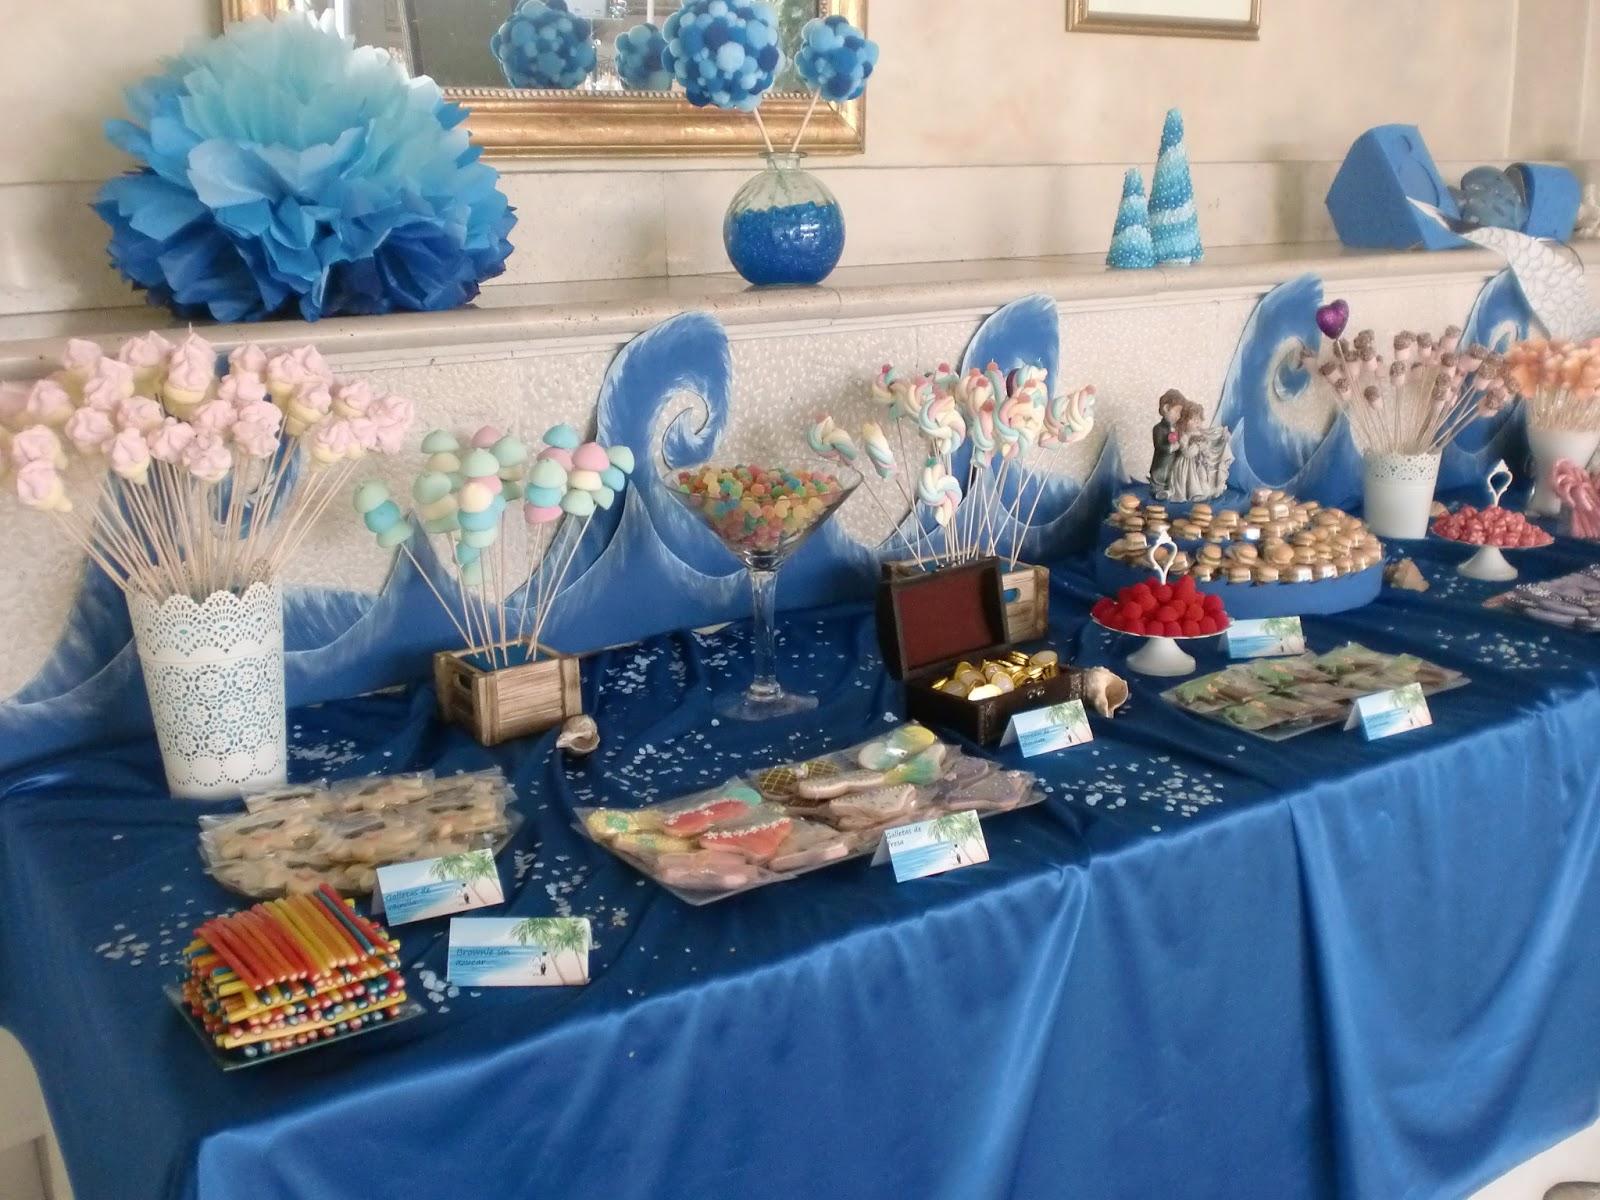 Galletas imperiales mesa dulce y chuches para una boda for Fotos de mesas de chuches para bodas